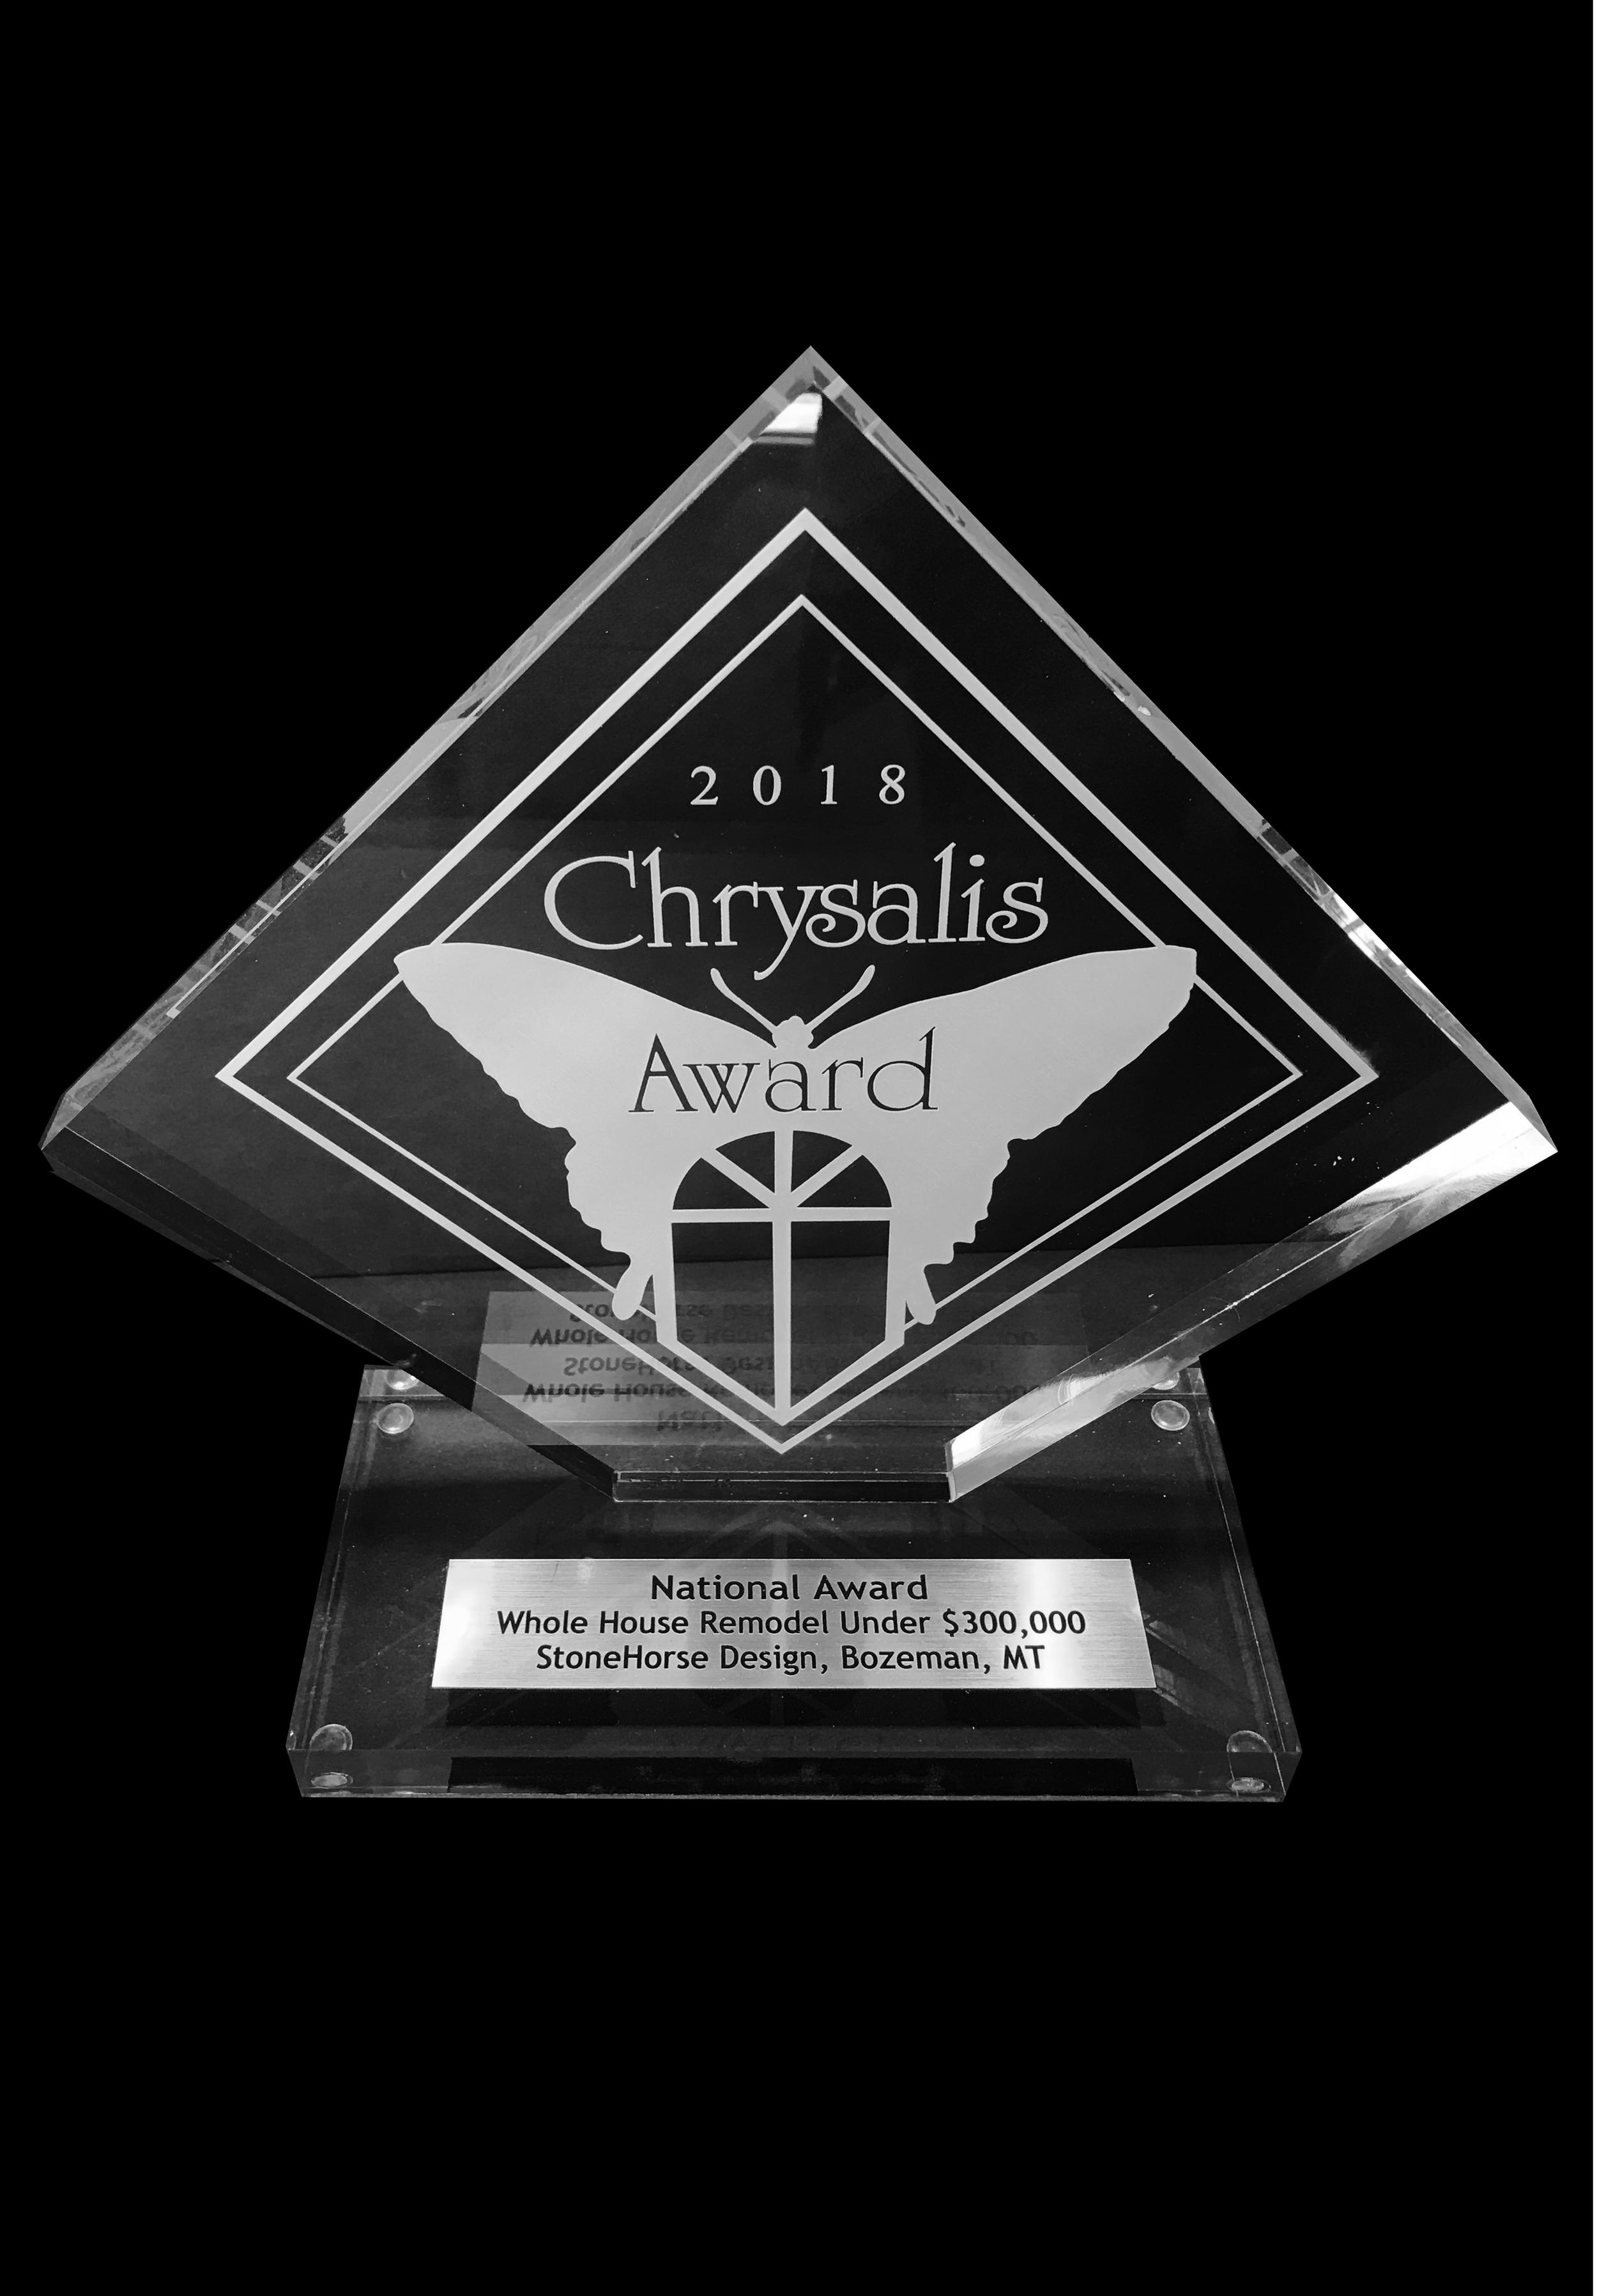 chrysalis_award.png